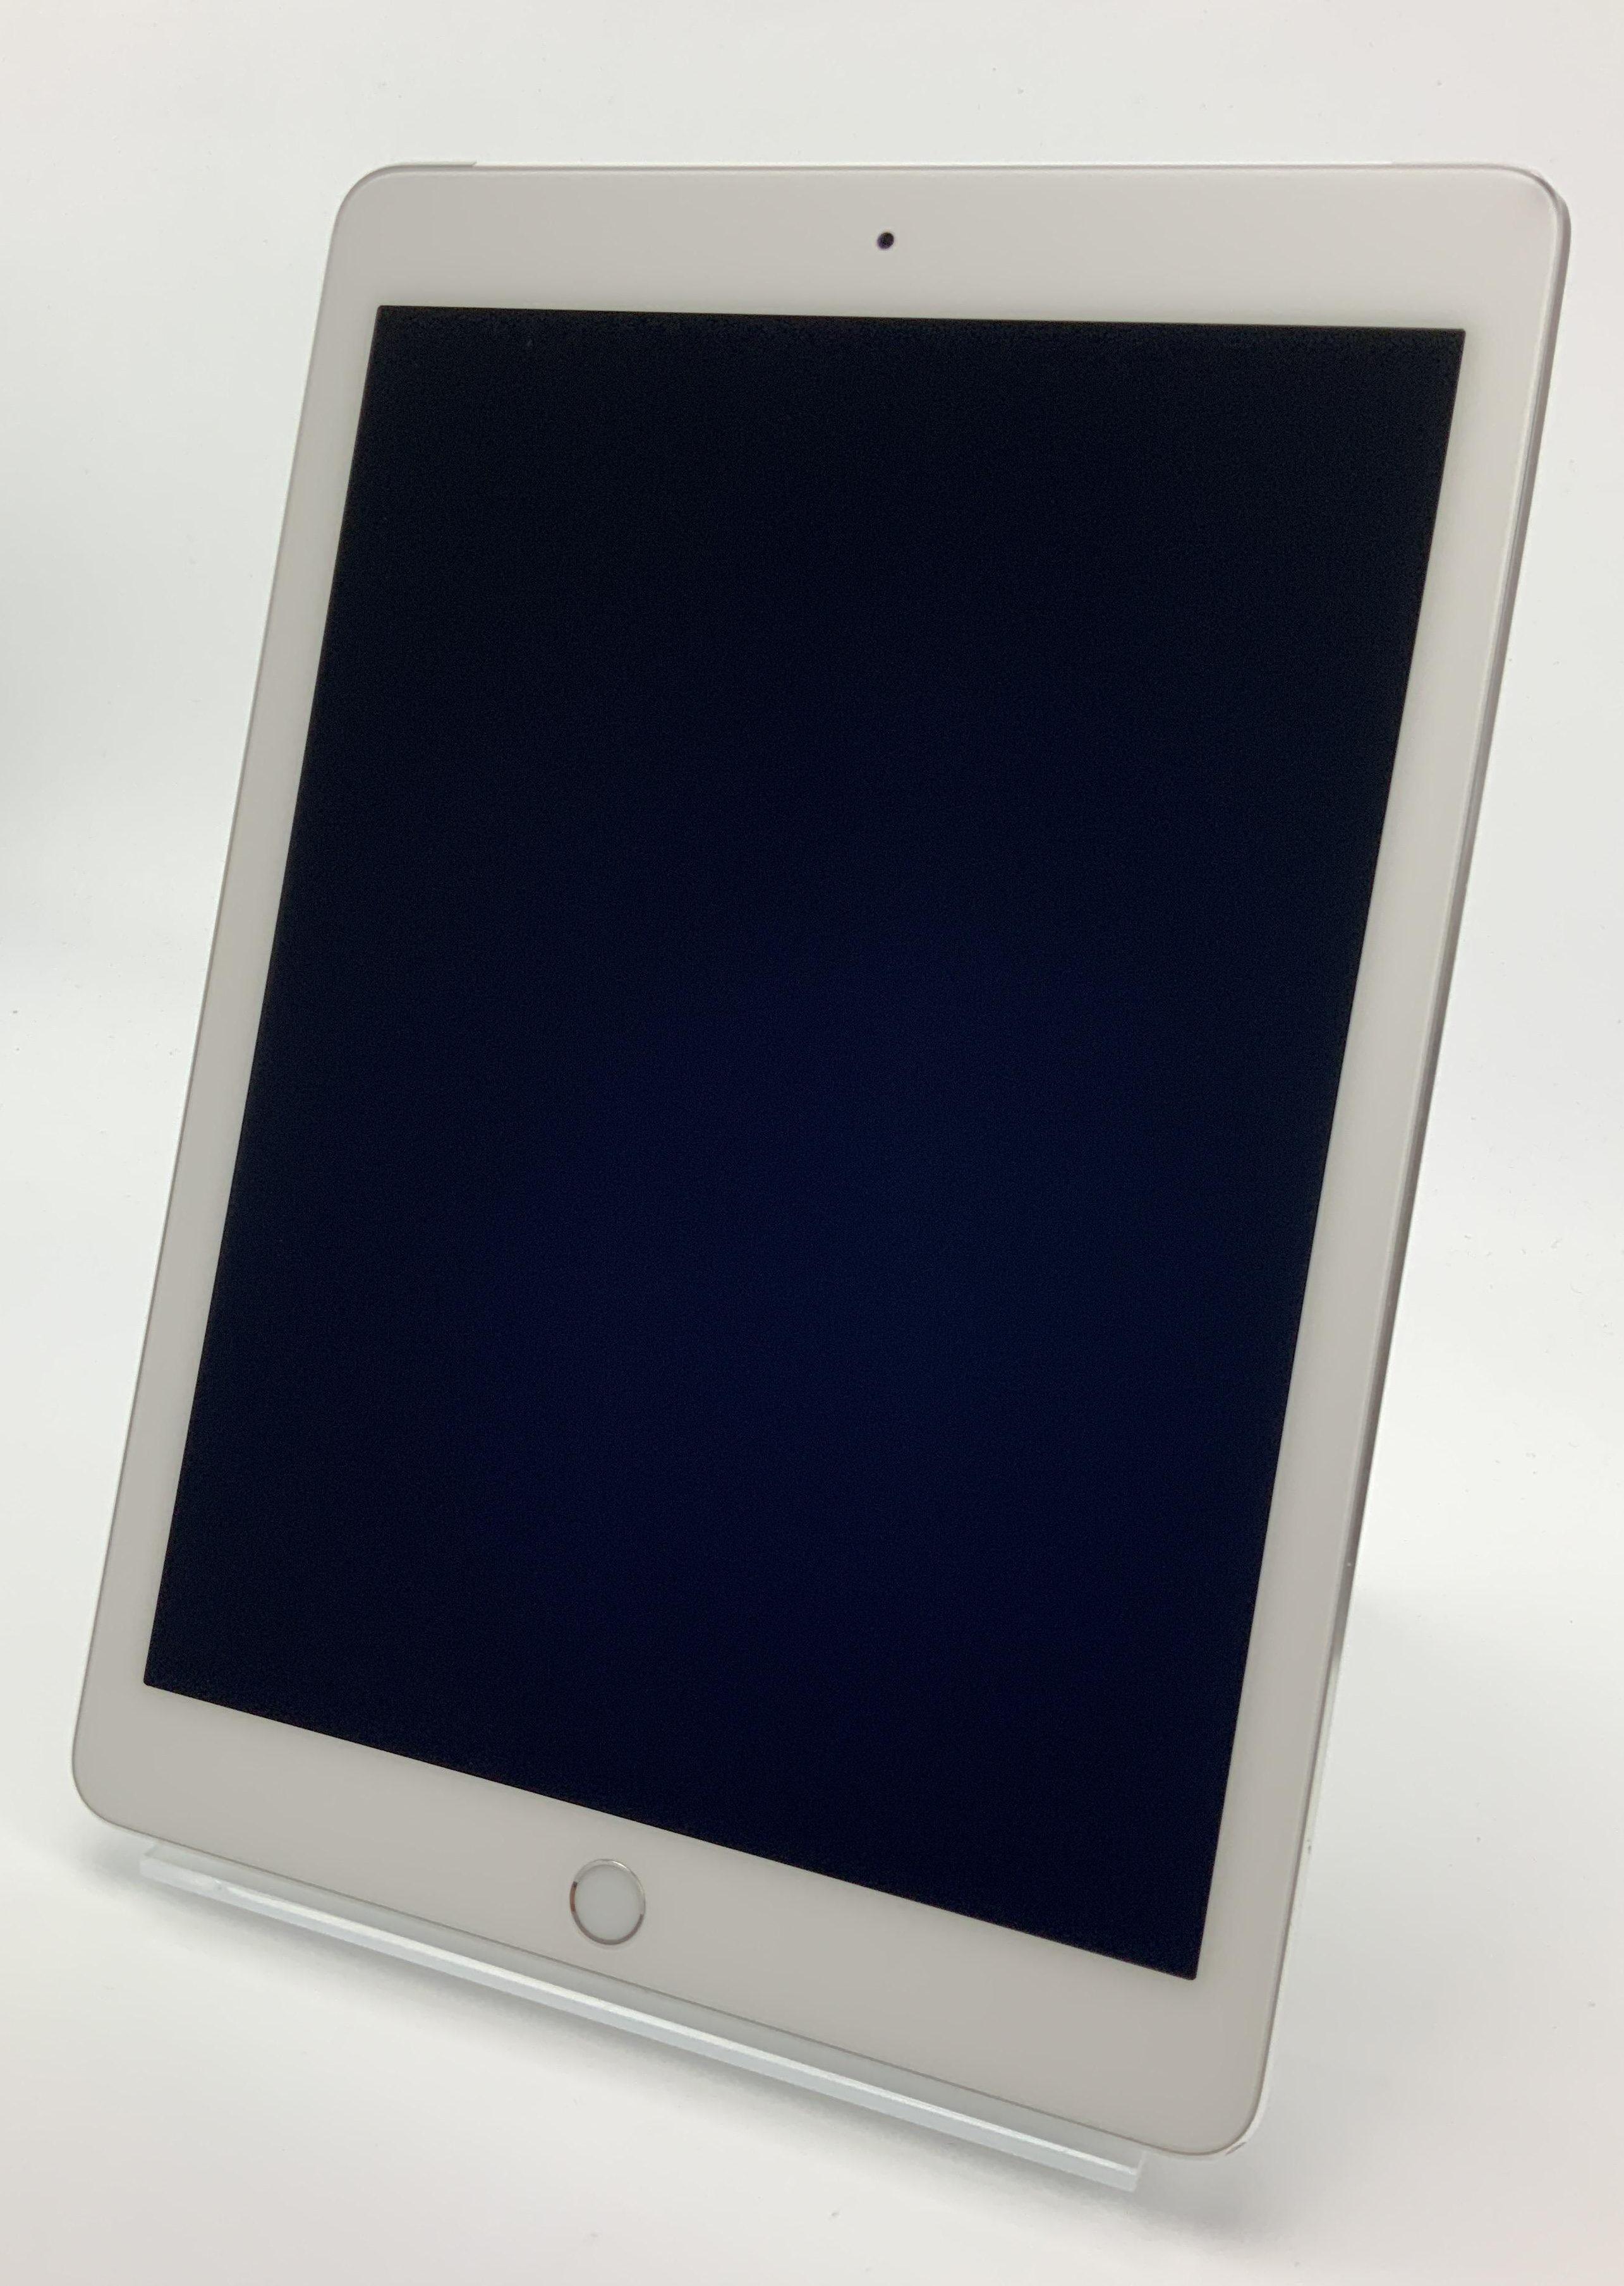 iPad Air 2 Wi-Fi + Cellular 16GB, 16GB, Silver, Afbeelding 1